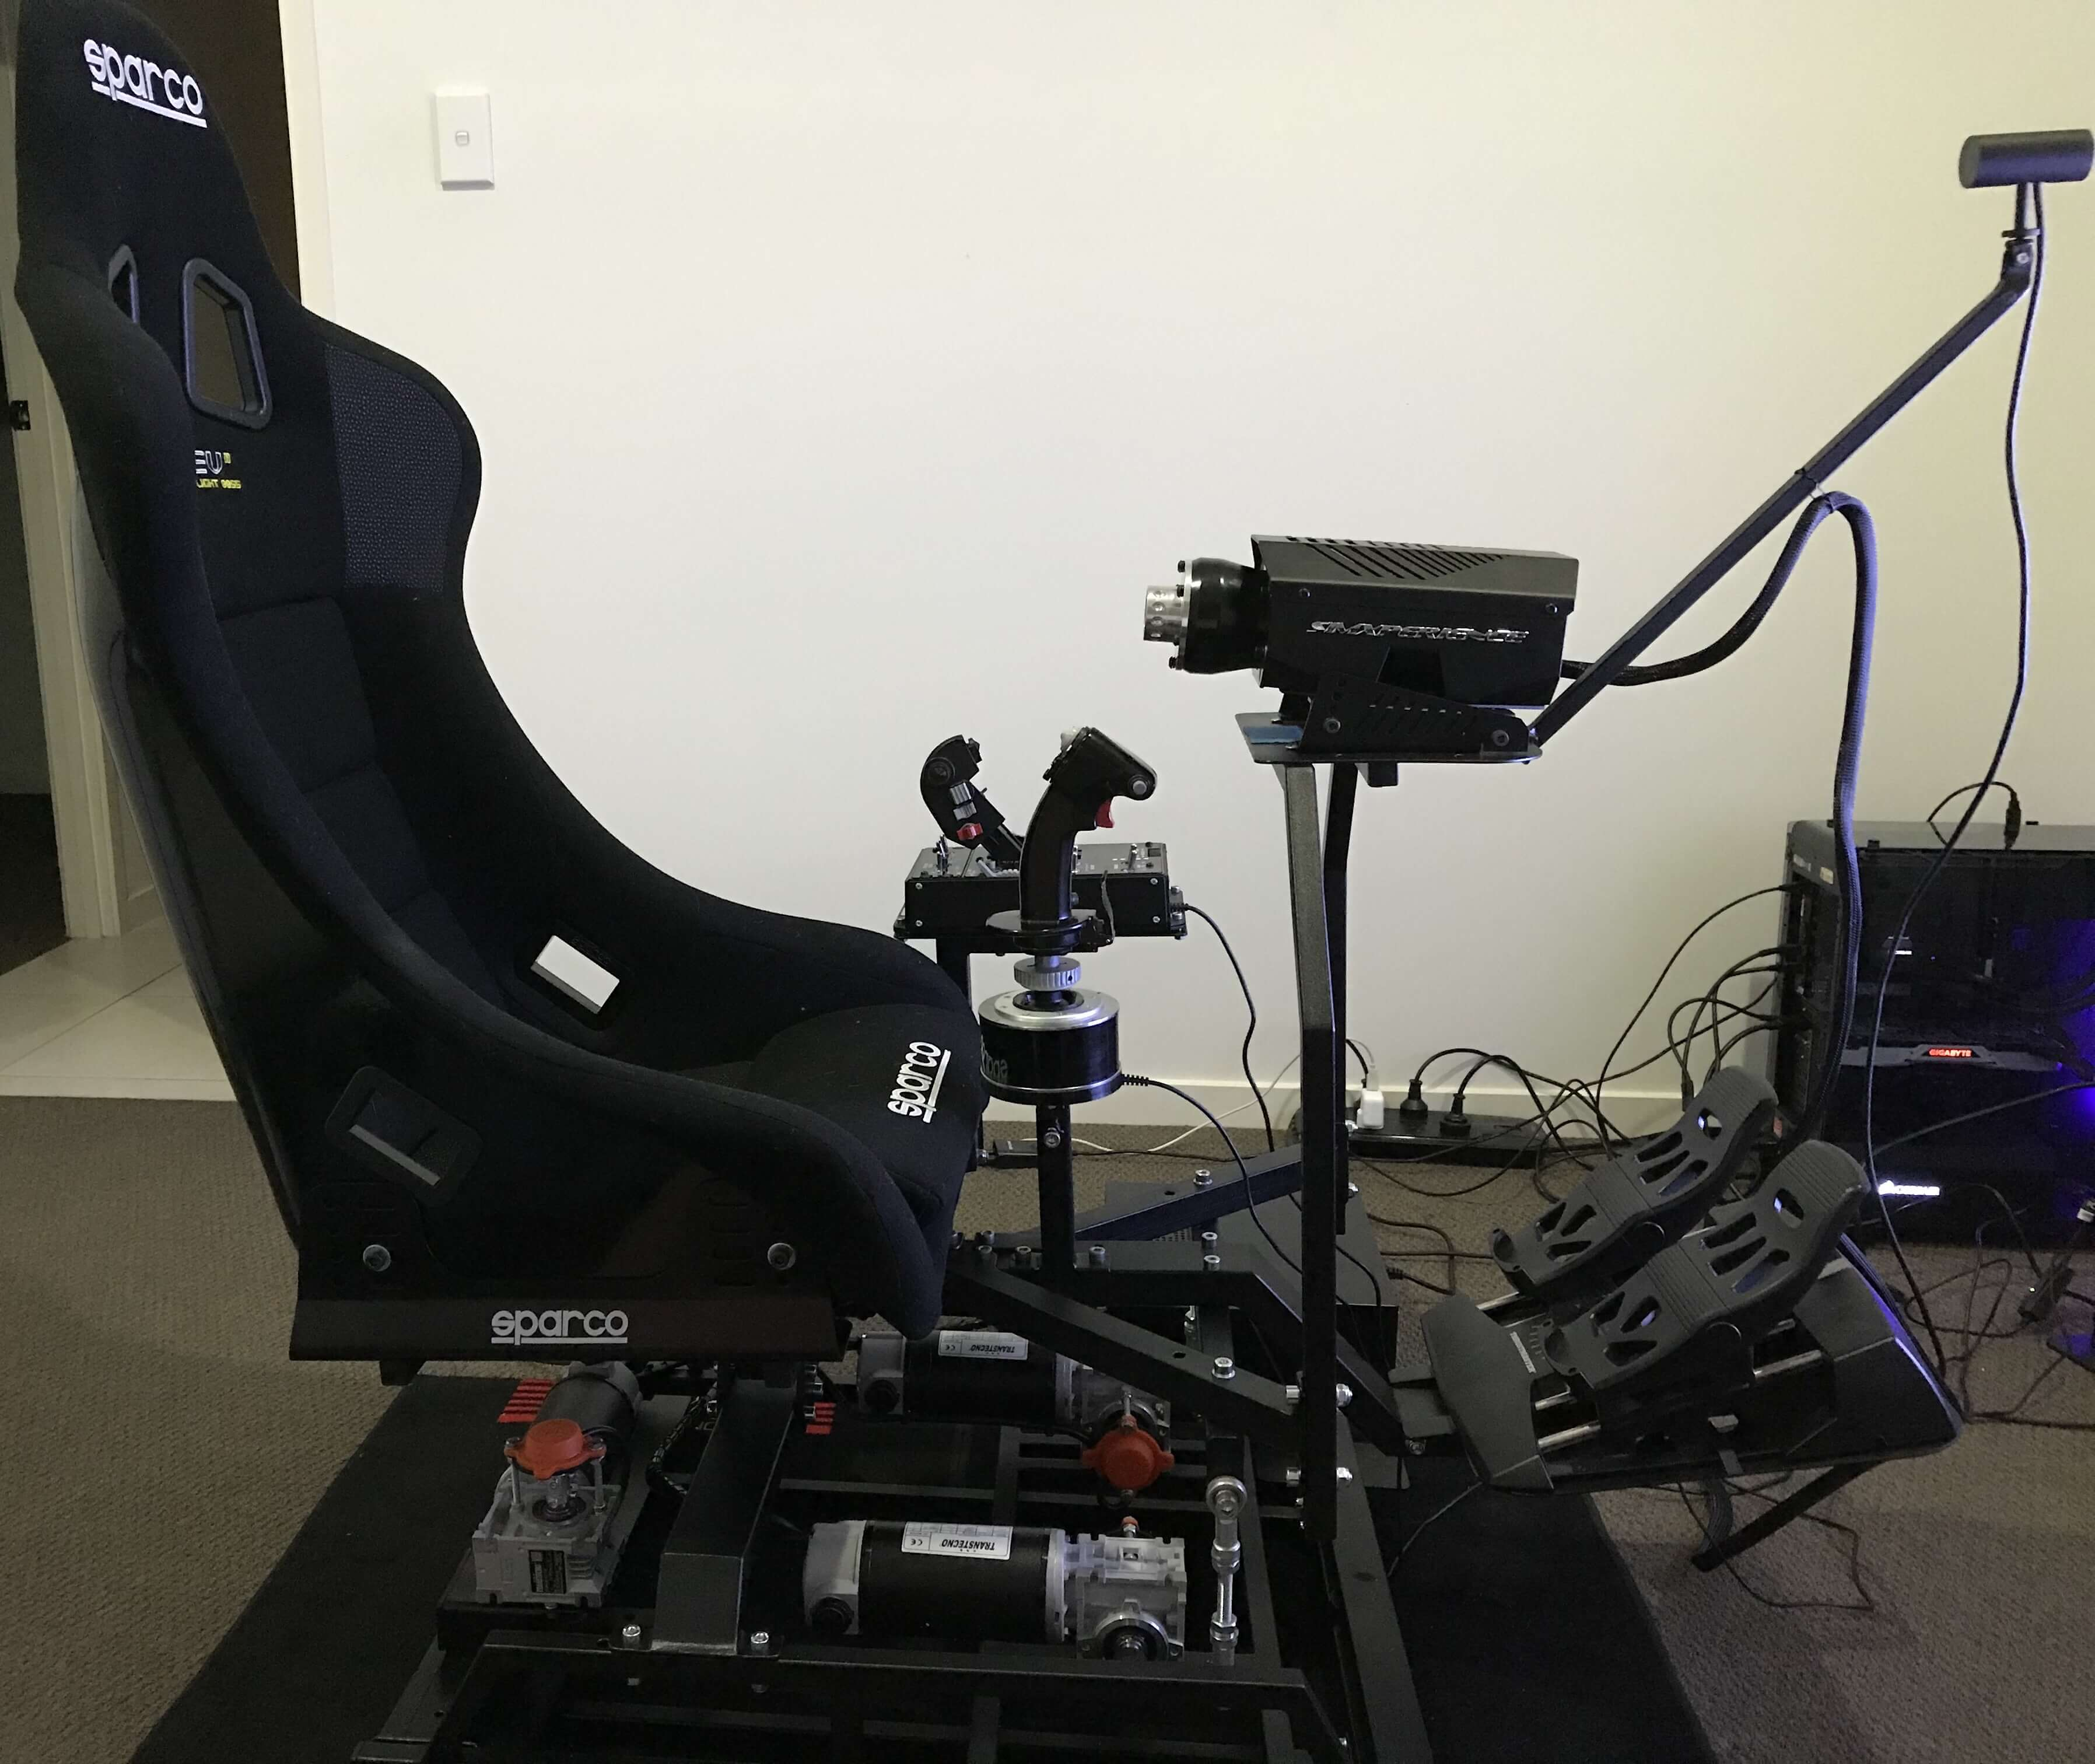 3dof sim with VR